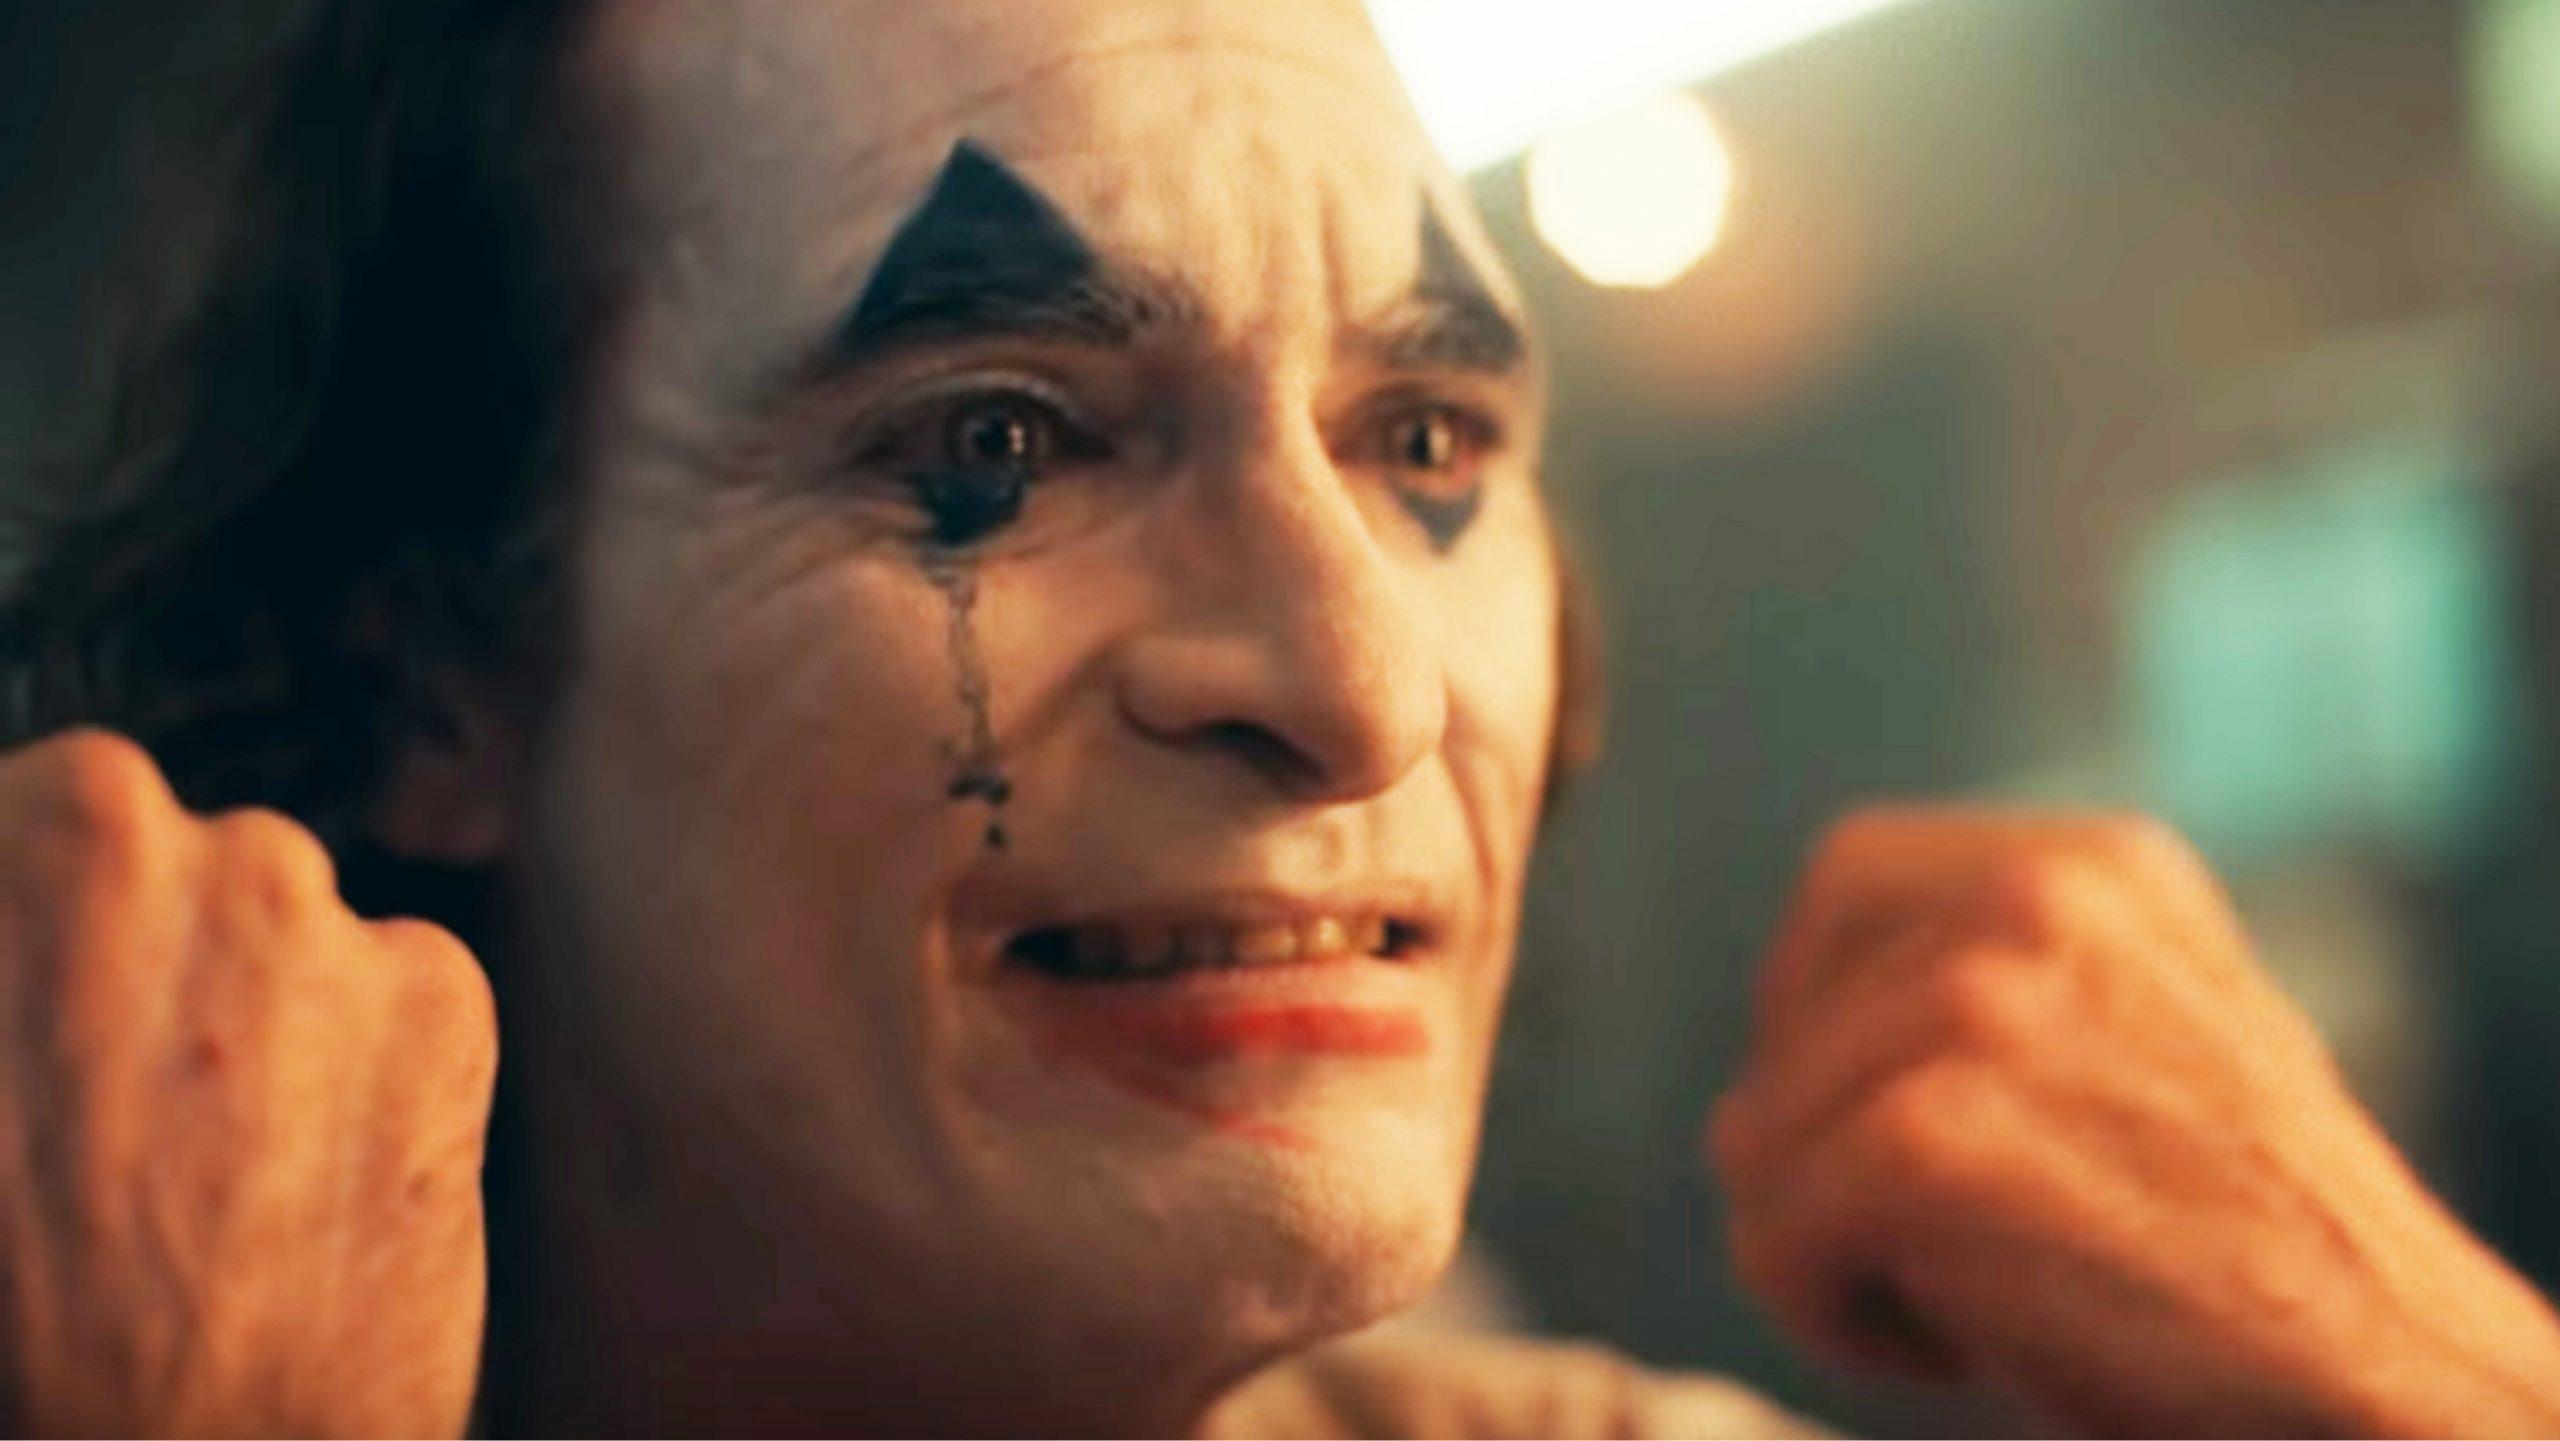 ventdouxprod 2019 nicolas barbier terrorisme nucléaire joker